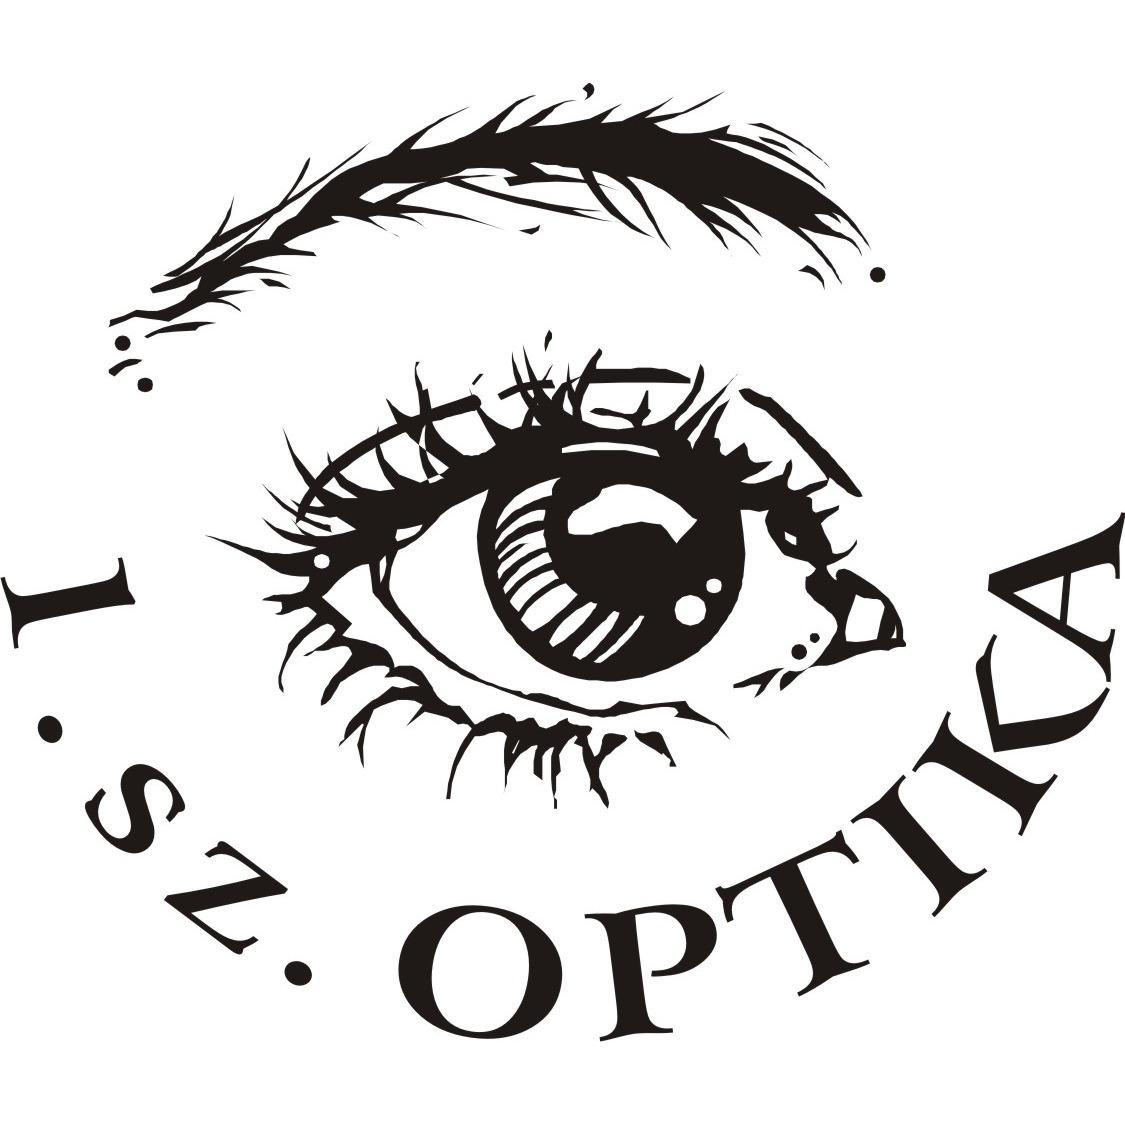 Egyes Optika